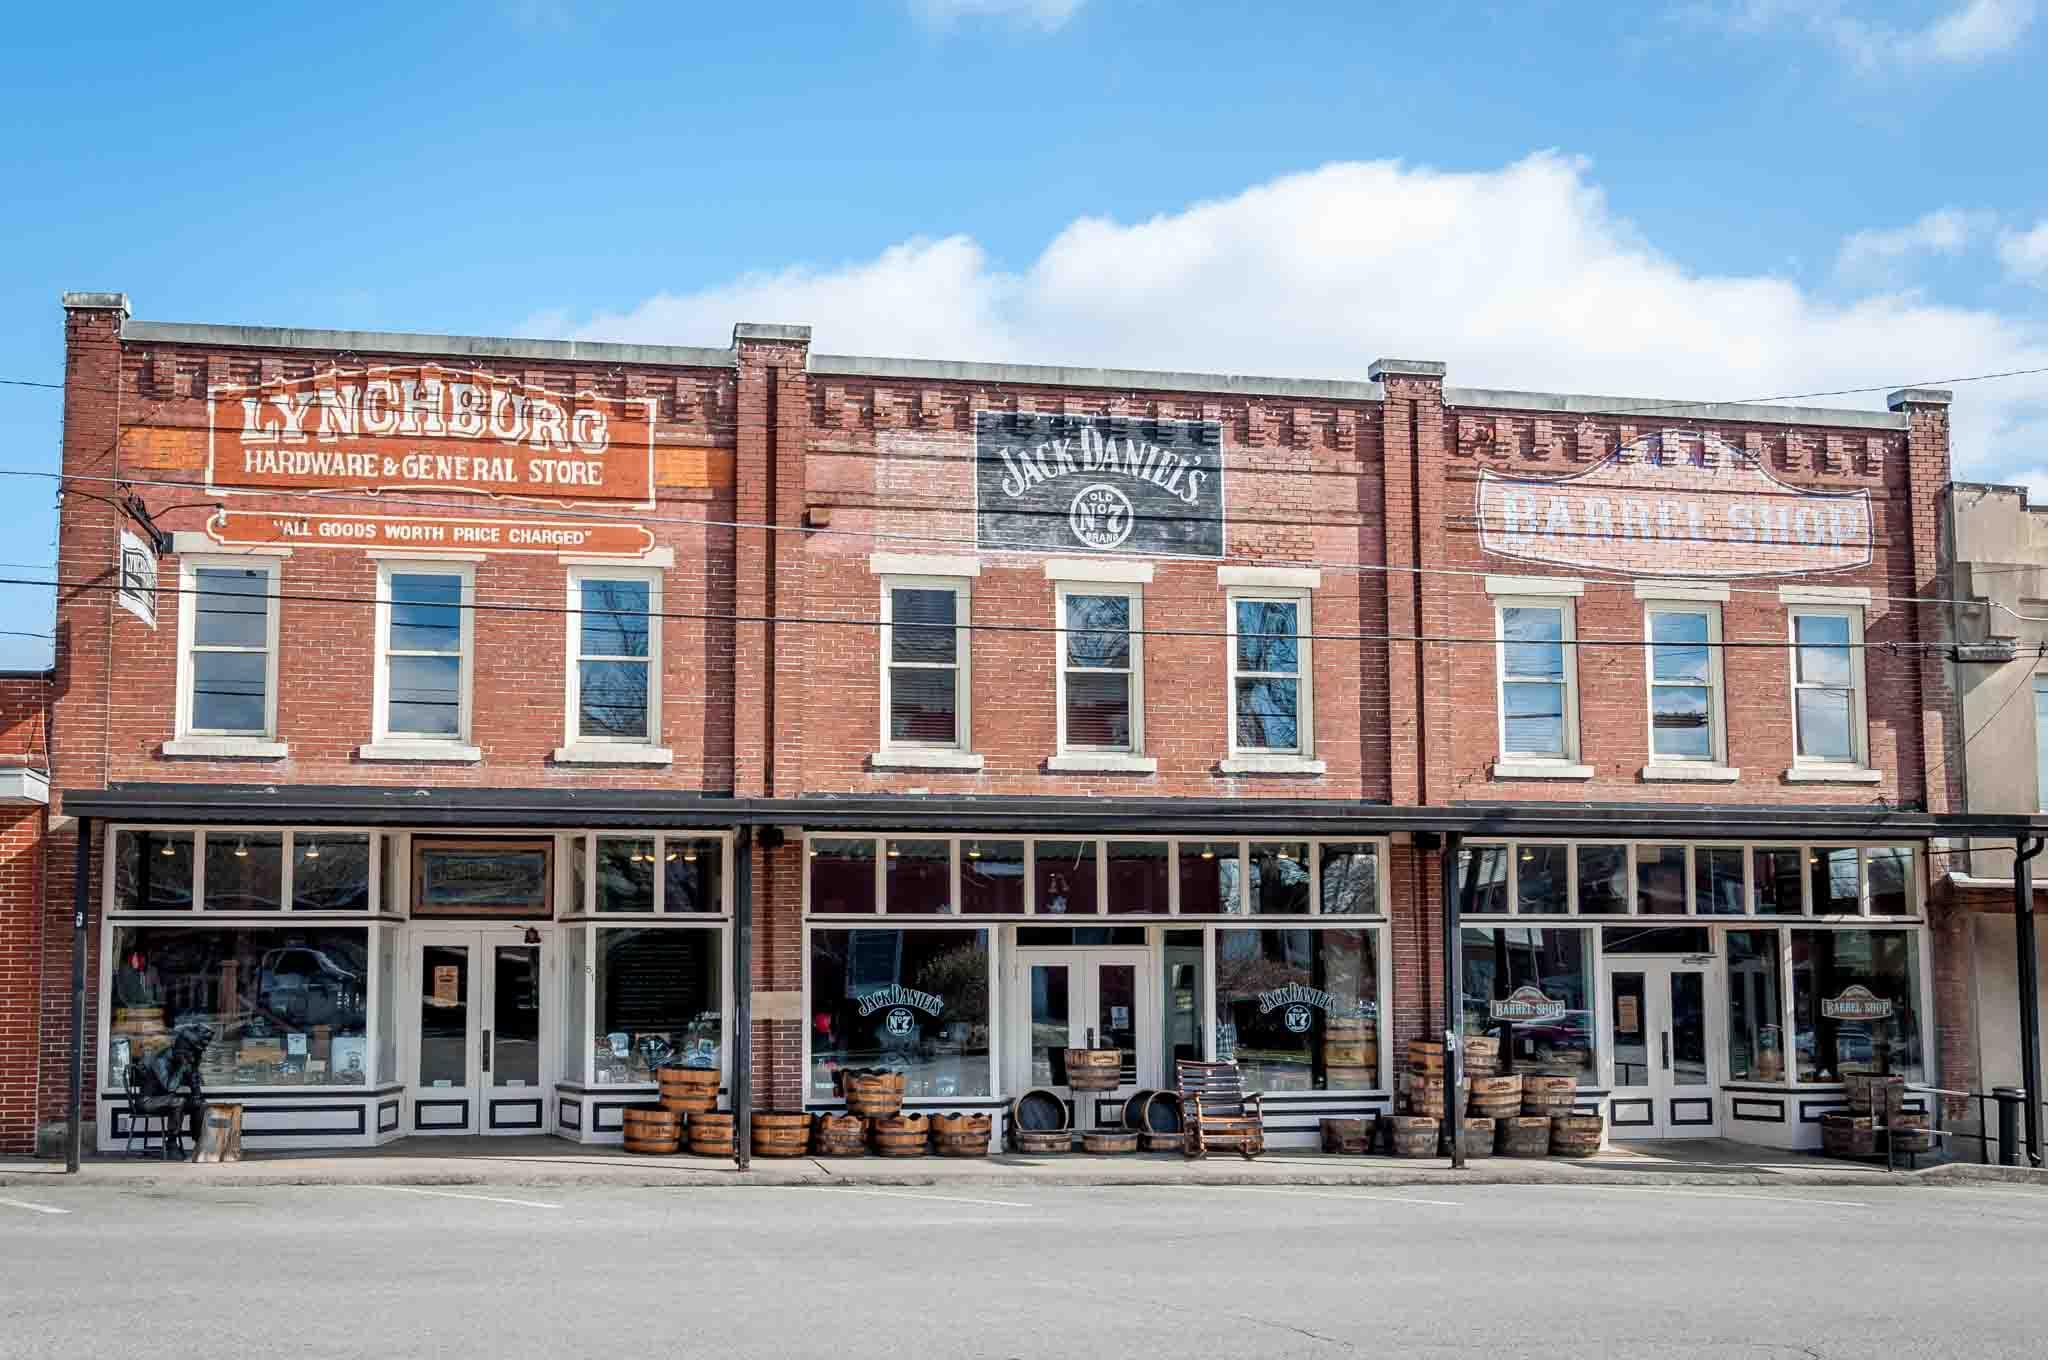 Brick building, Lynchburg Hardware & General Store